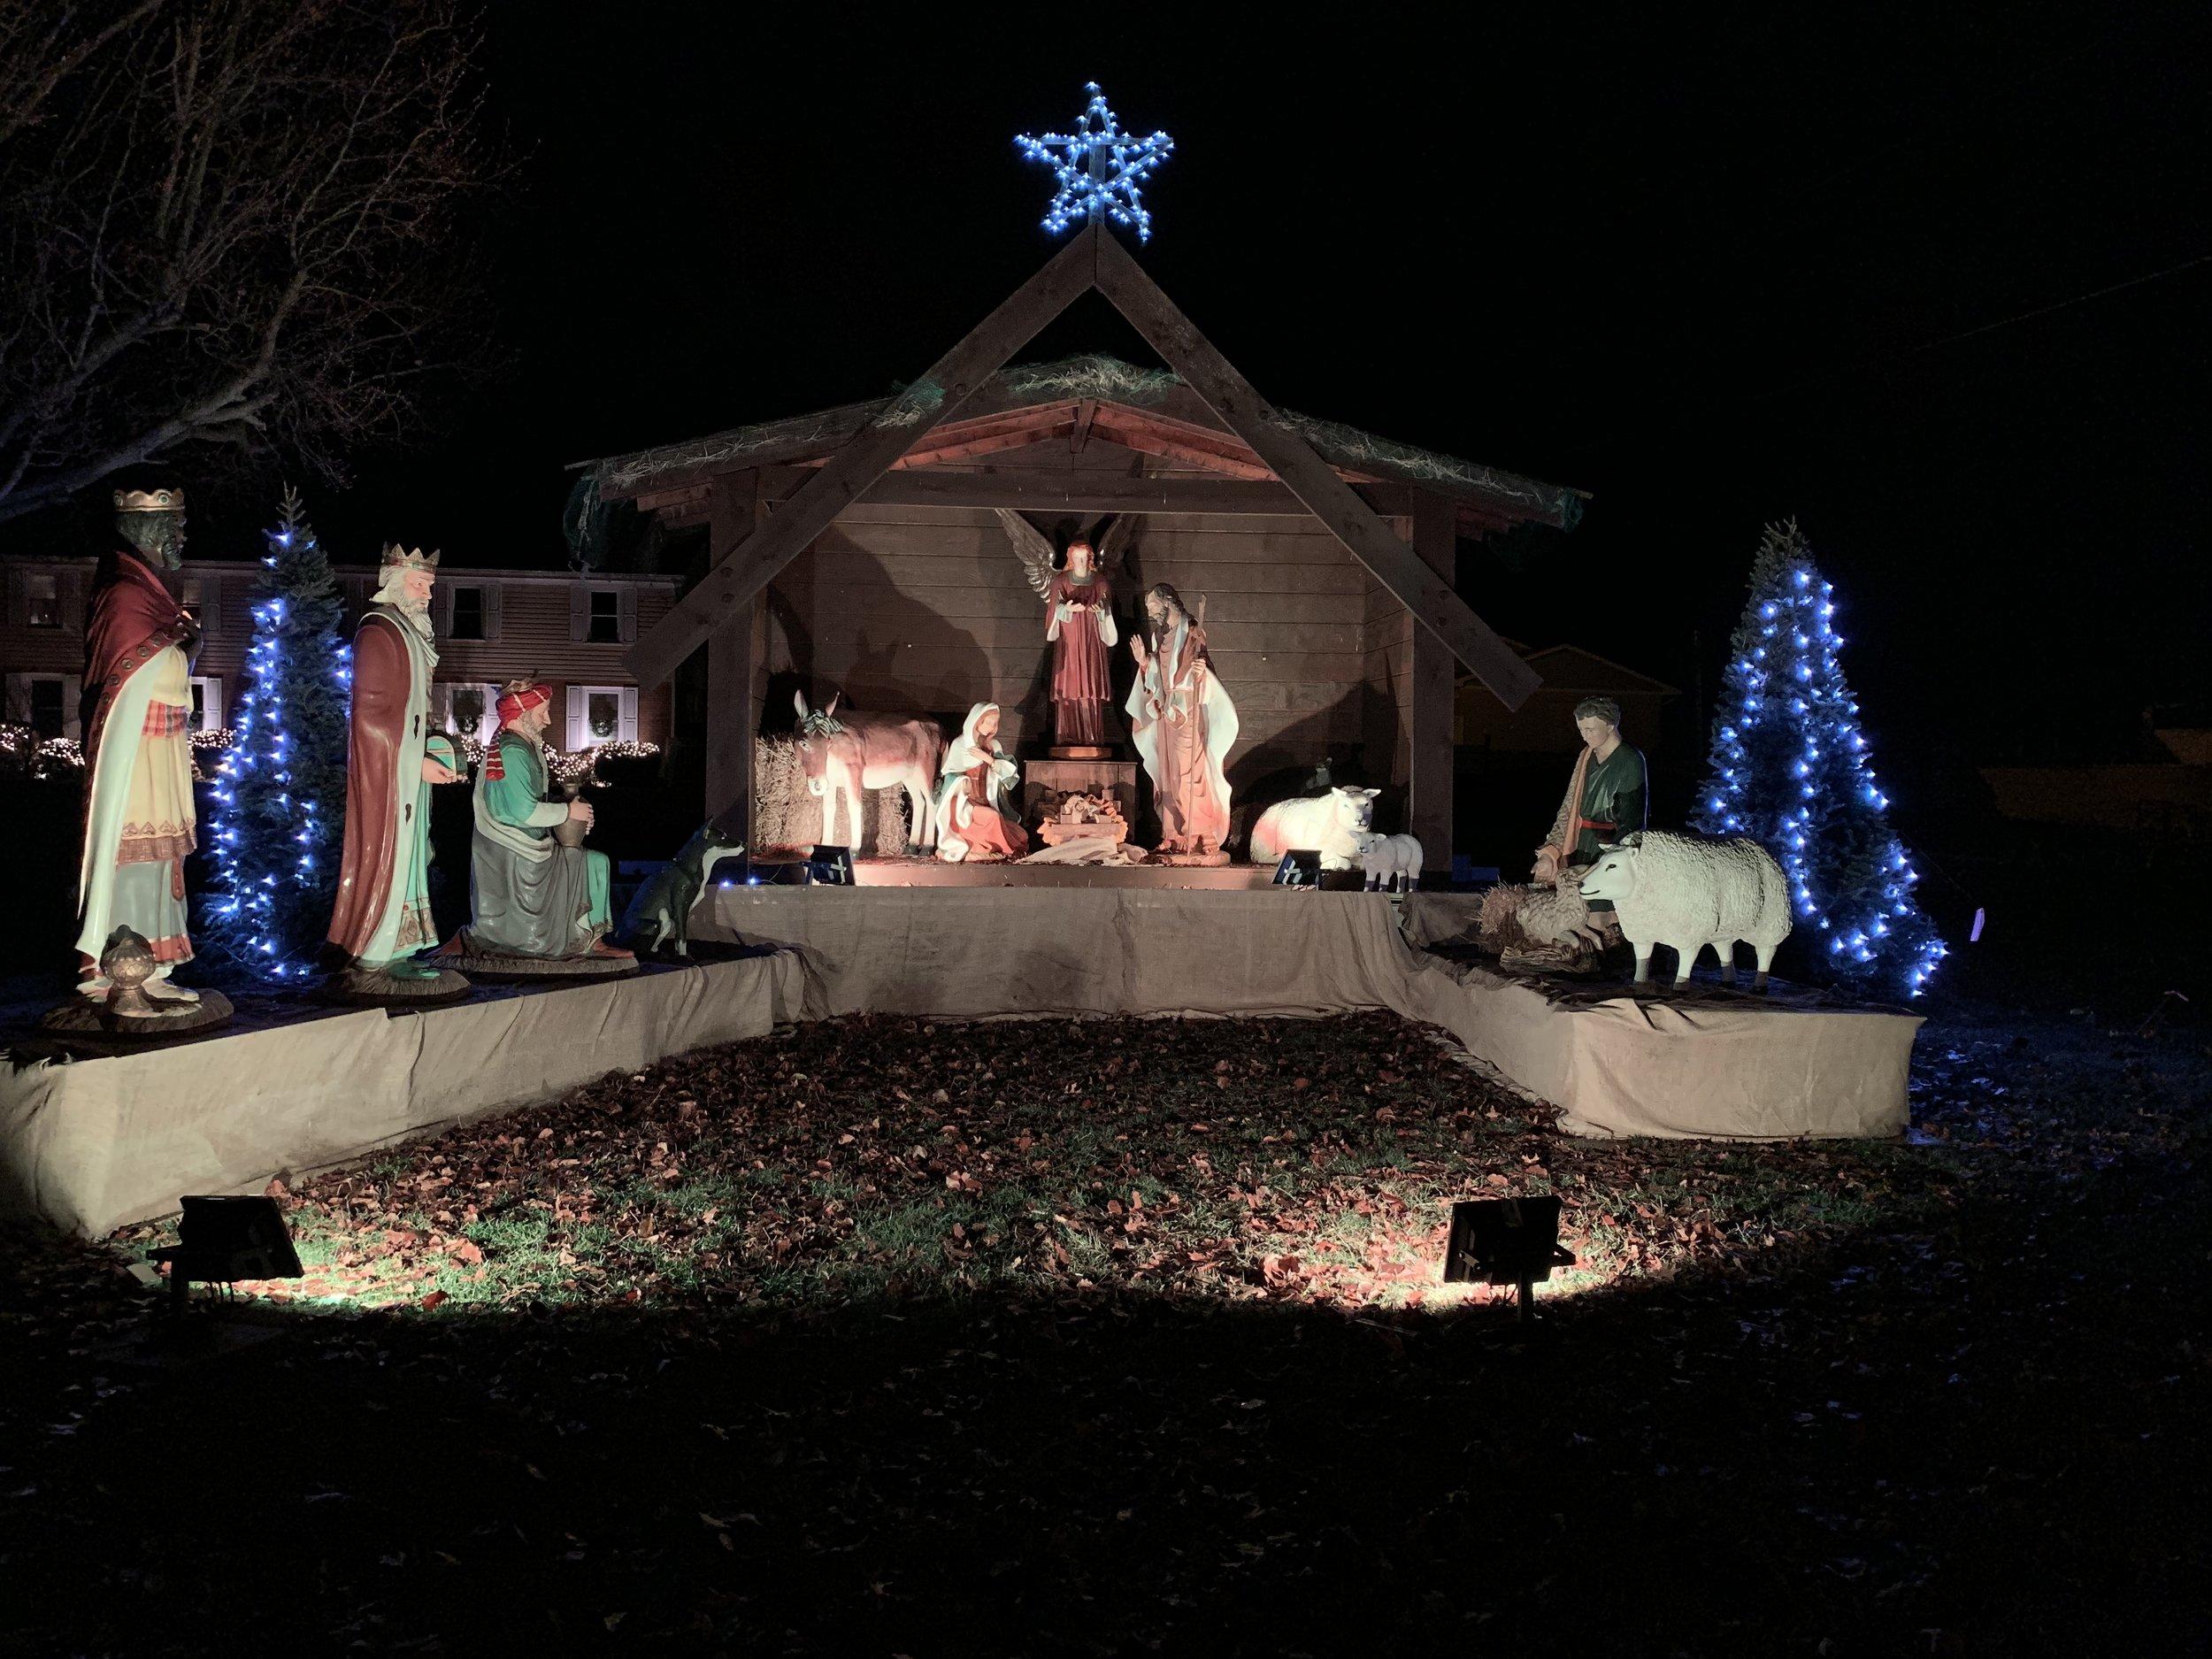 The outdoor nativity scene from Blessed Sacrament parish in Wintersville, Ohio.